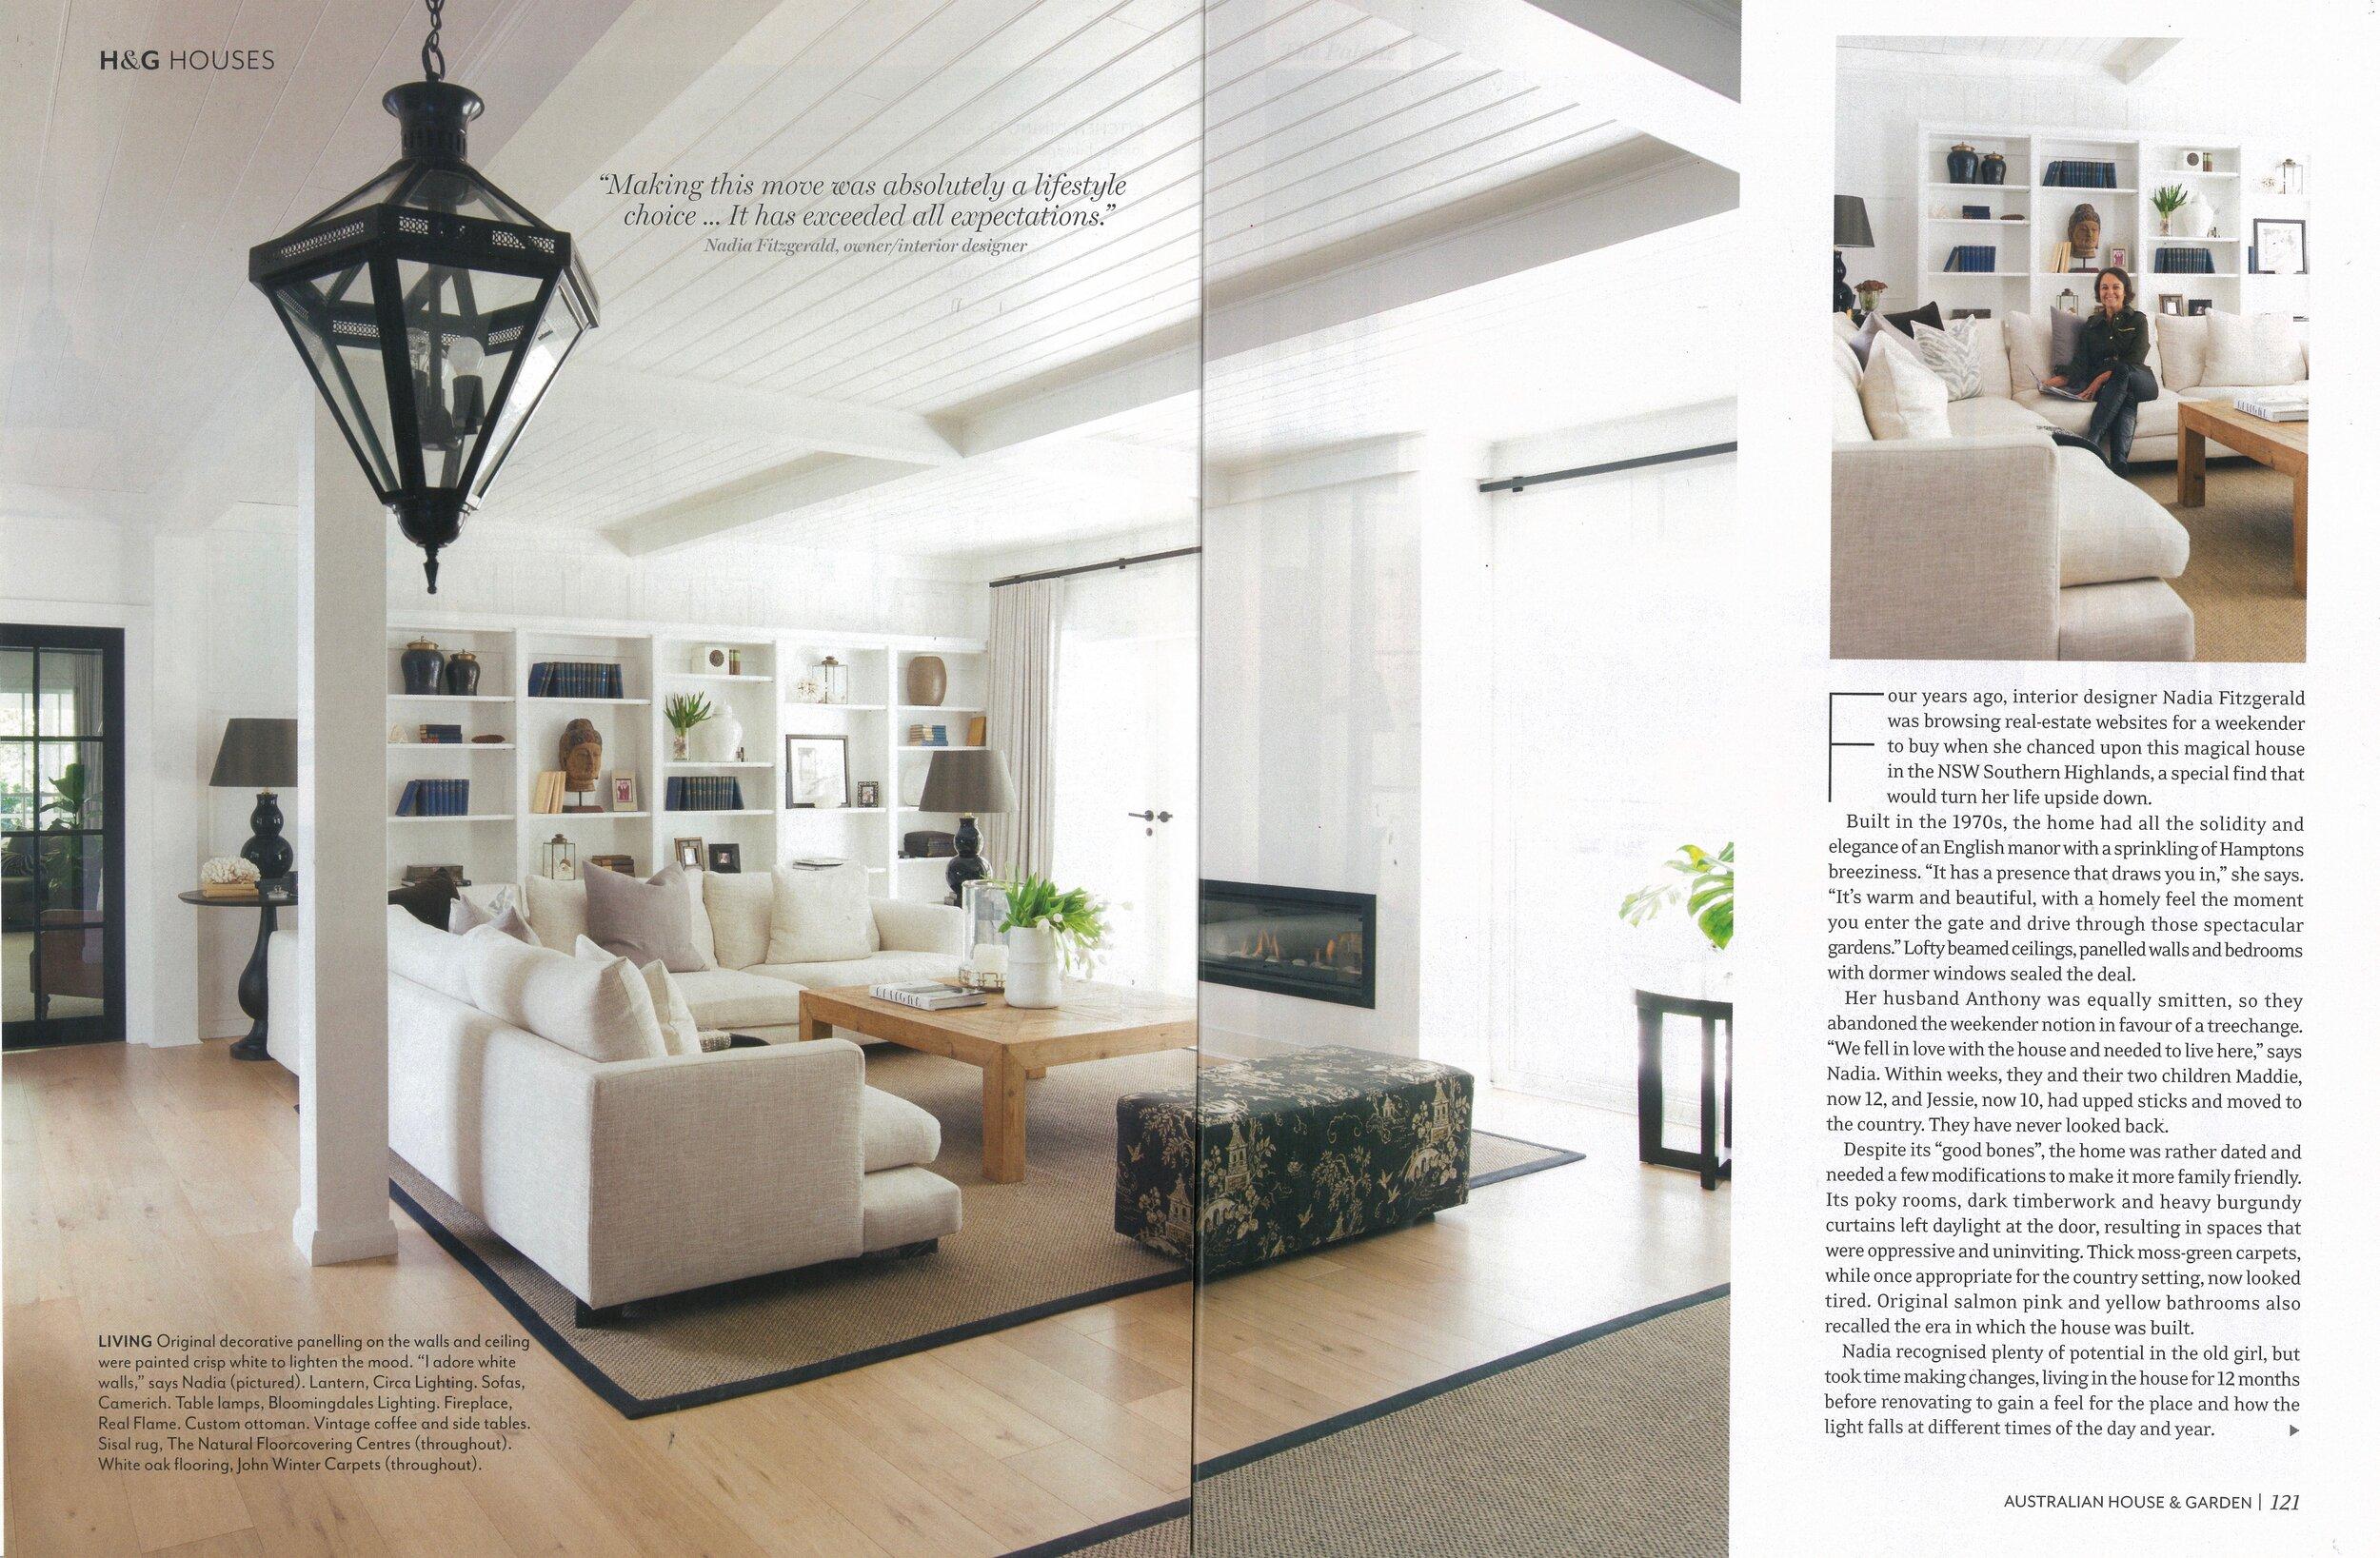 Lazytime Plus featured in Australian House & Garden